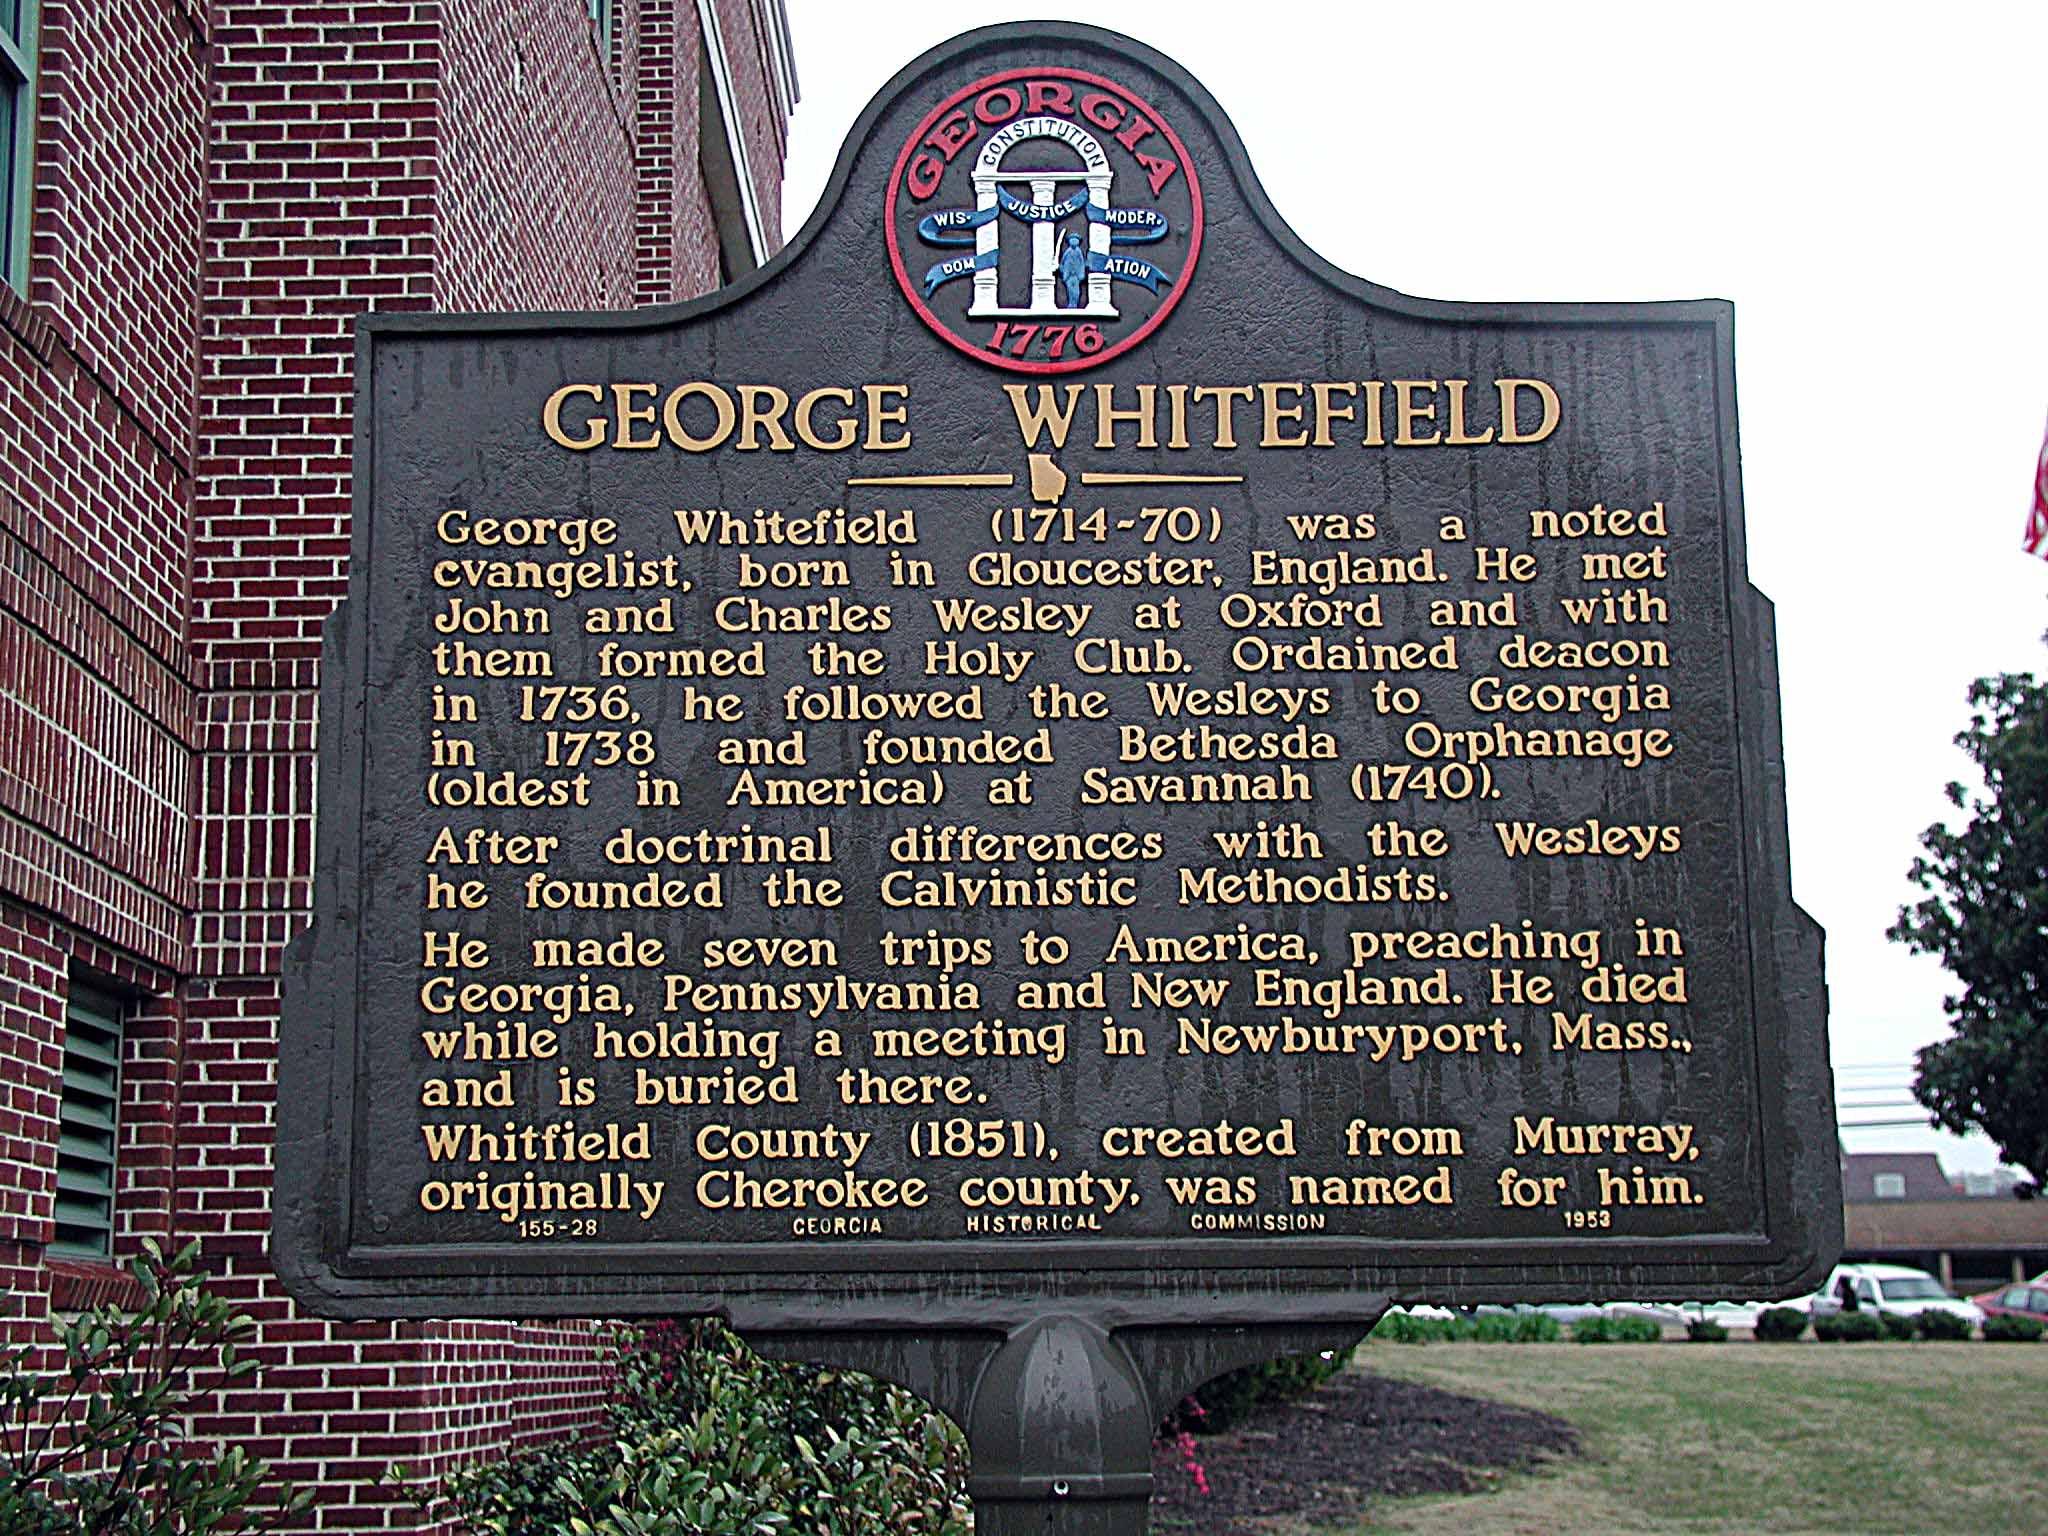 George Whitefield Commemorative Symposium